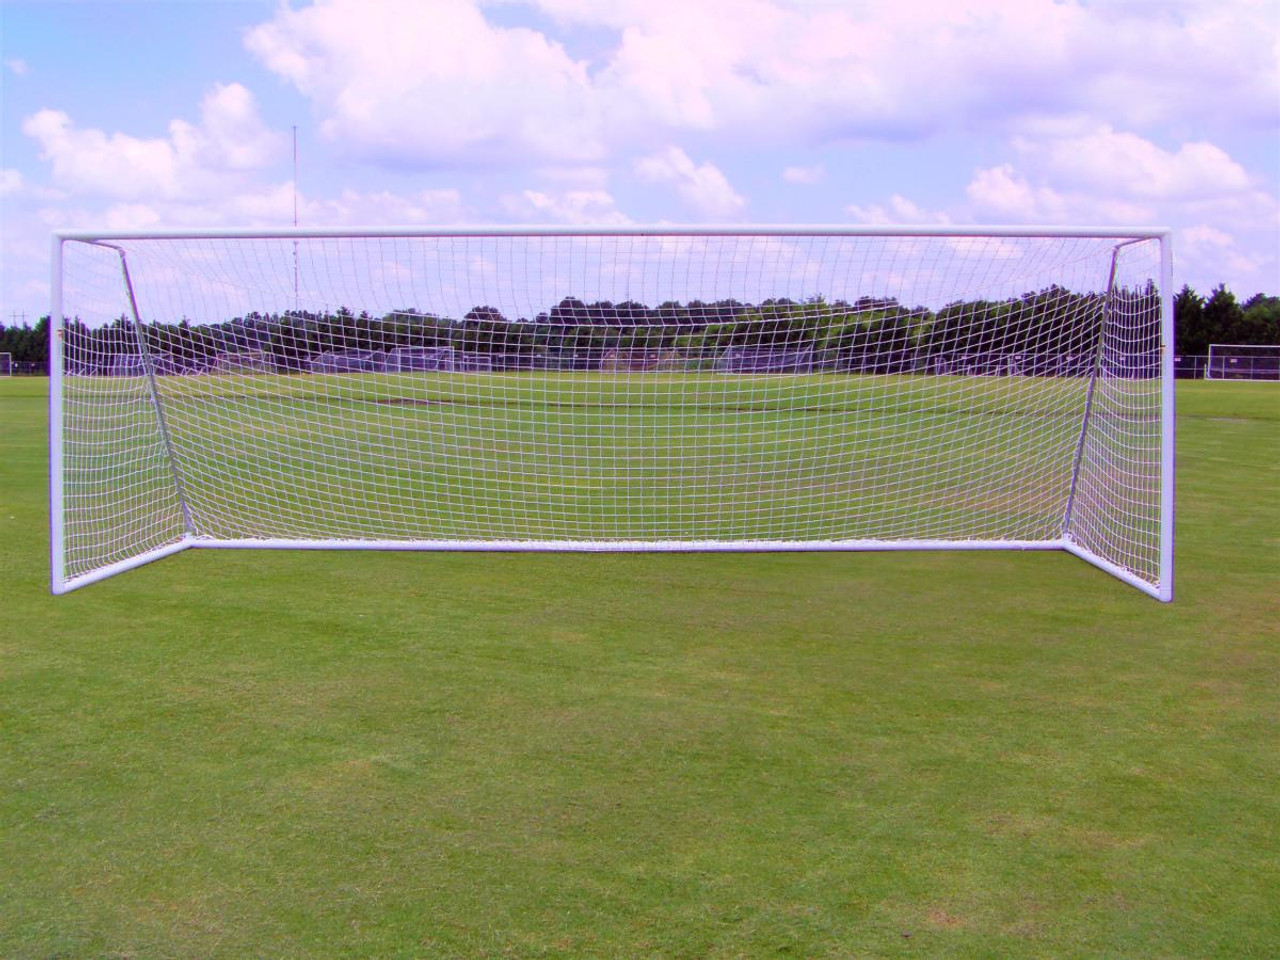 Pevo soccer goals 8' x 24' park series